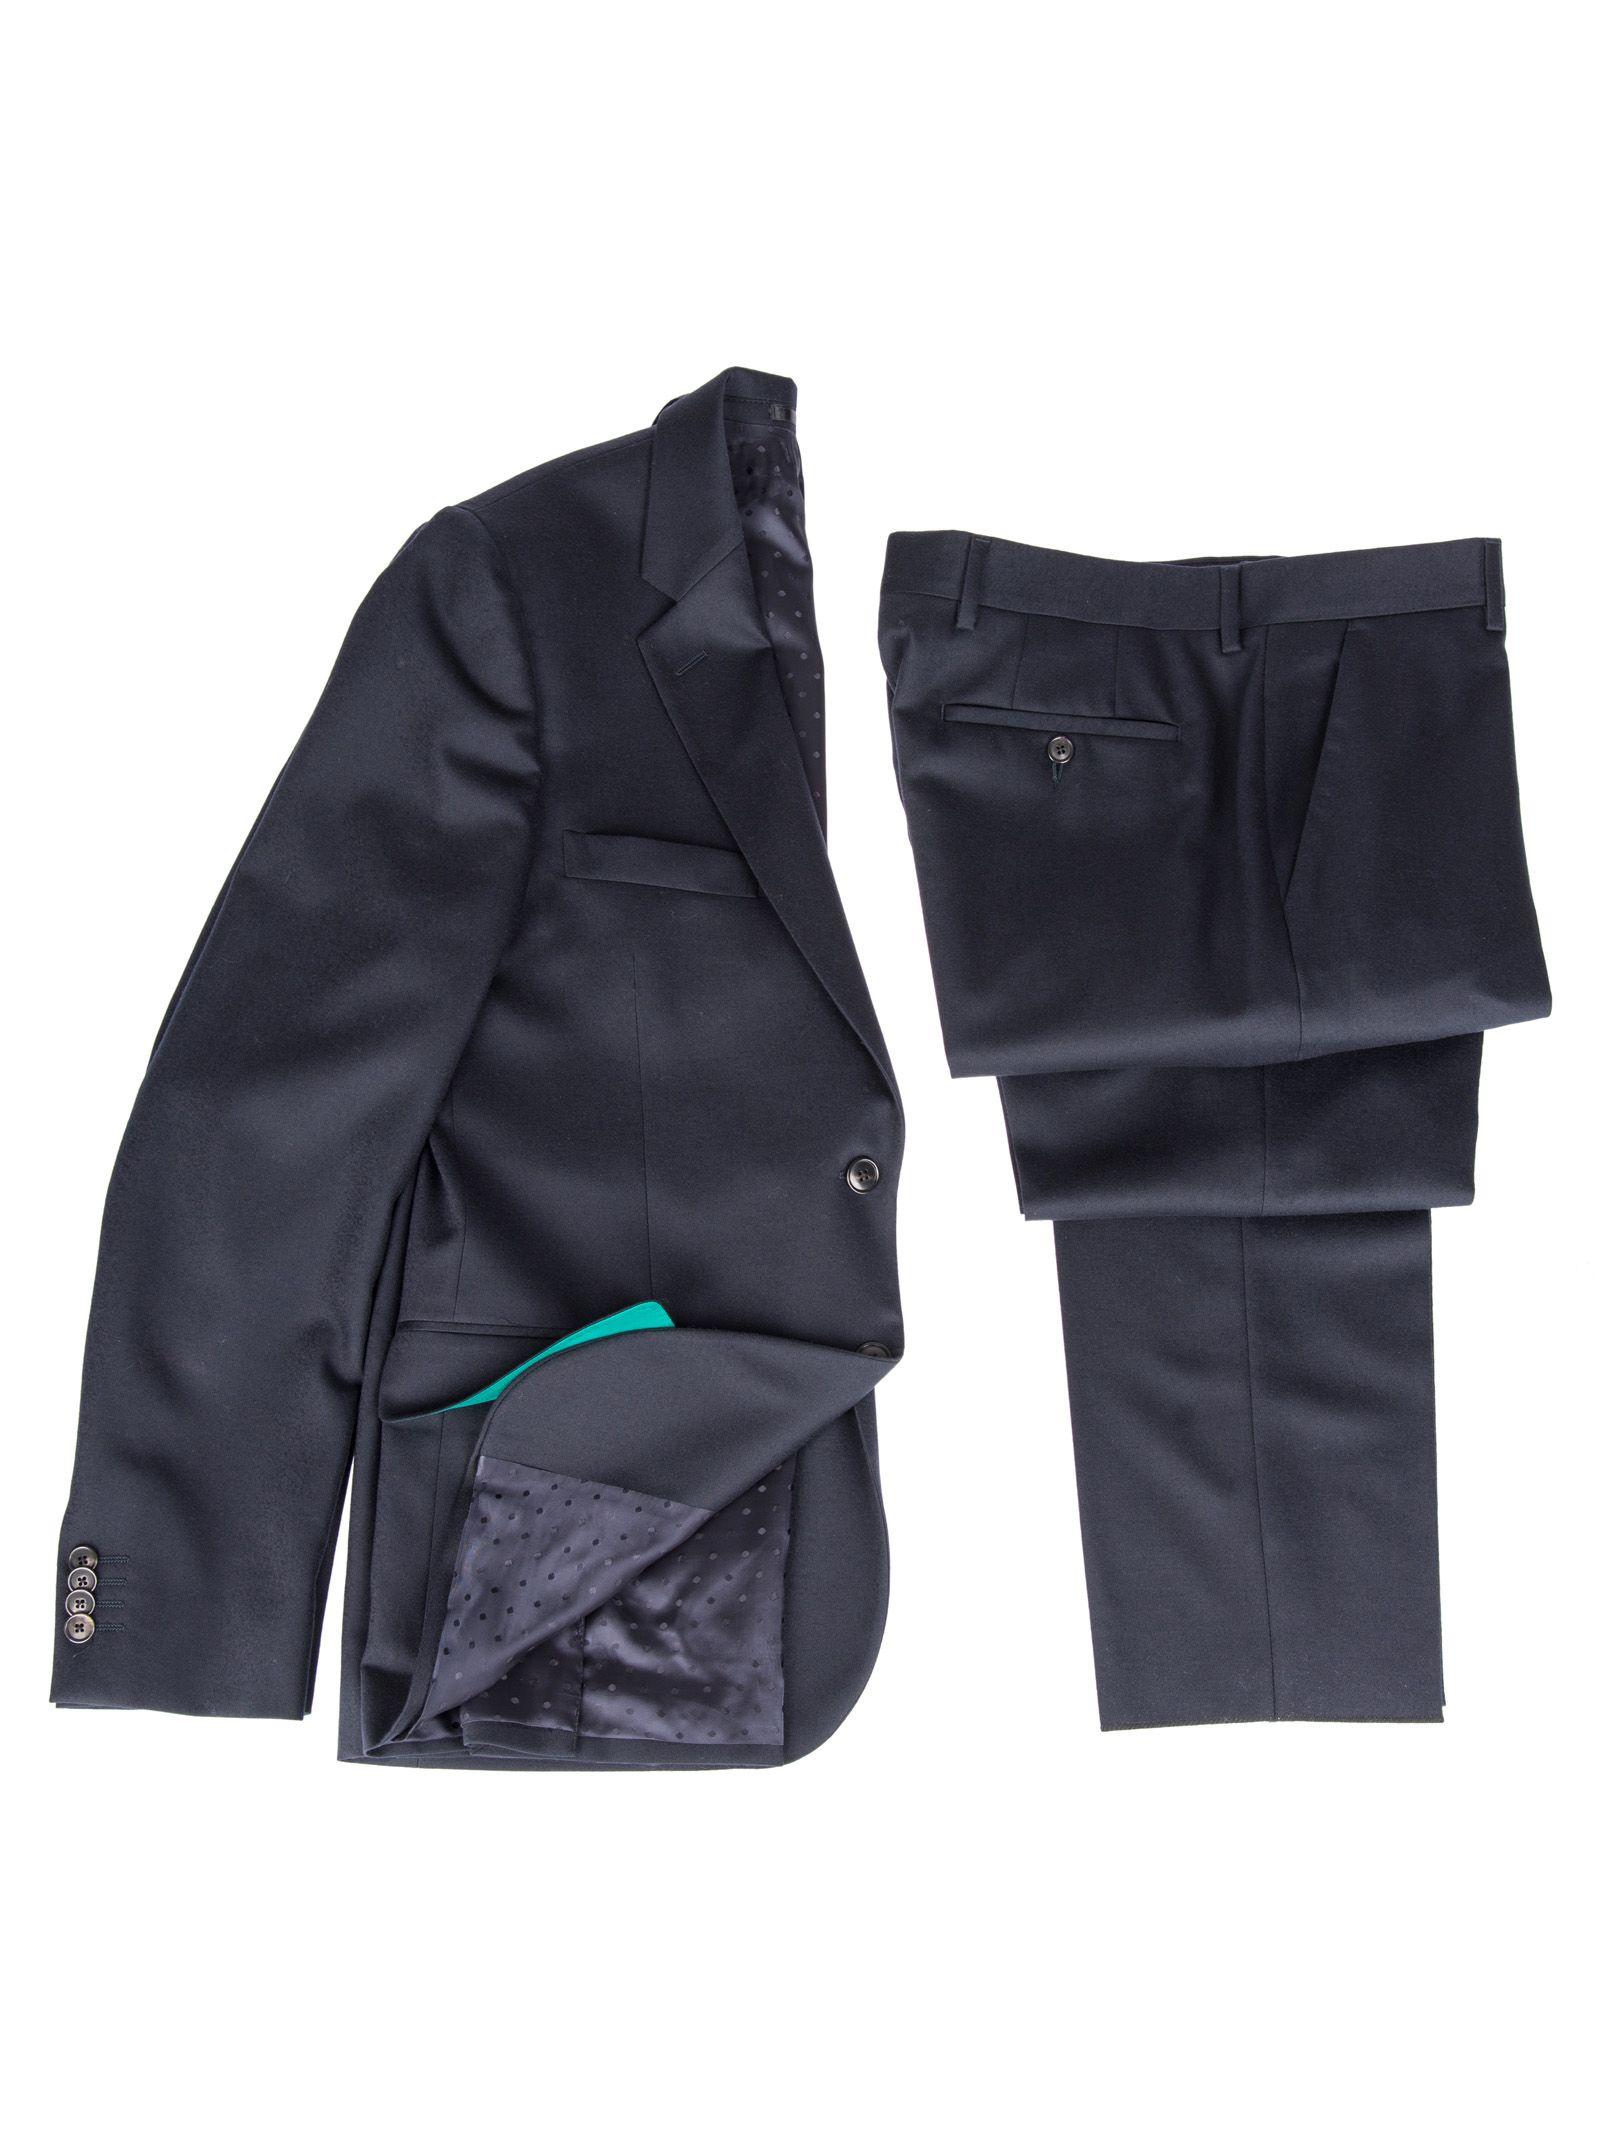 Paul Smith Classic Suit